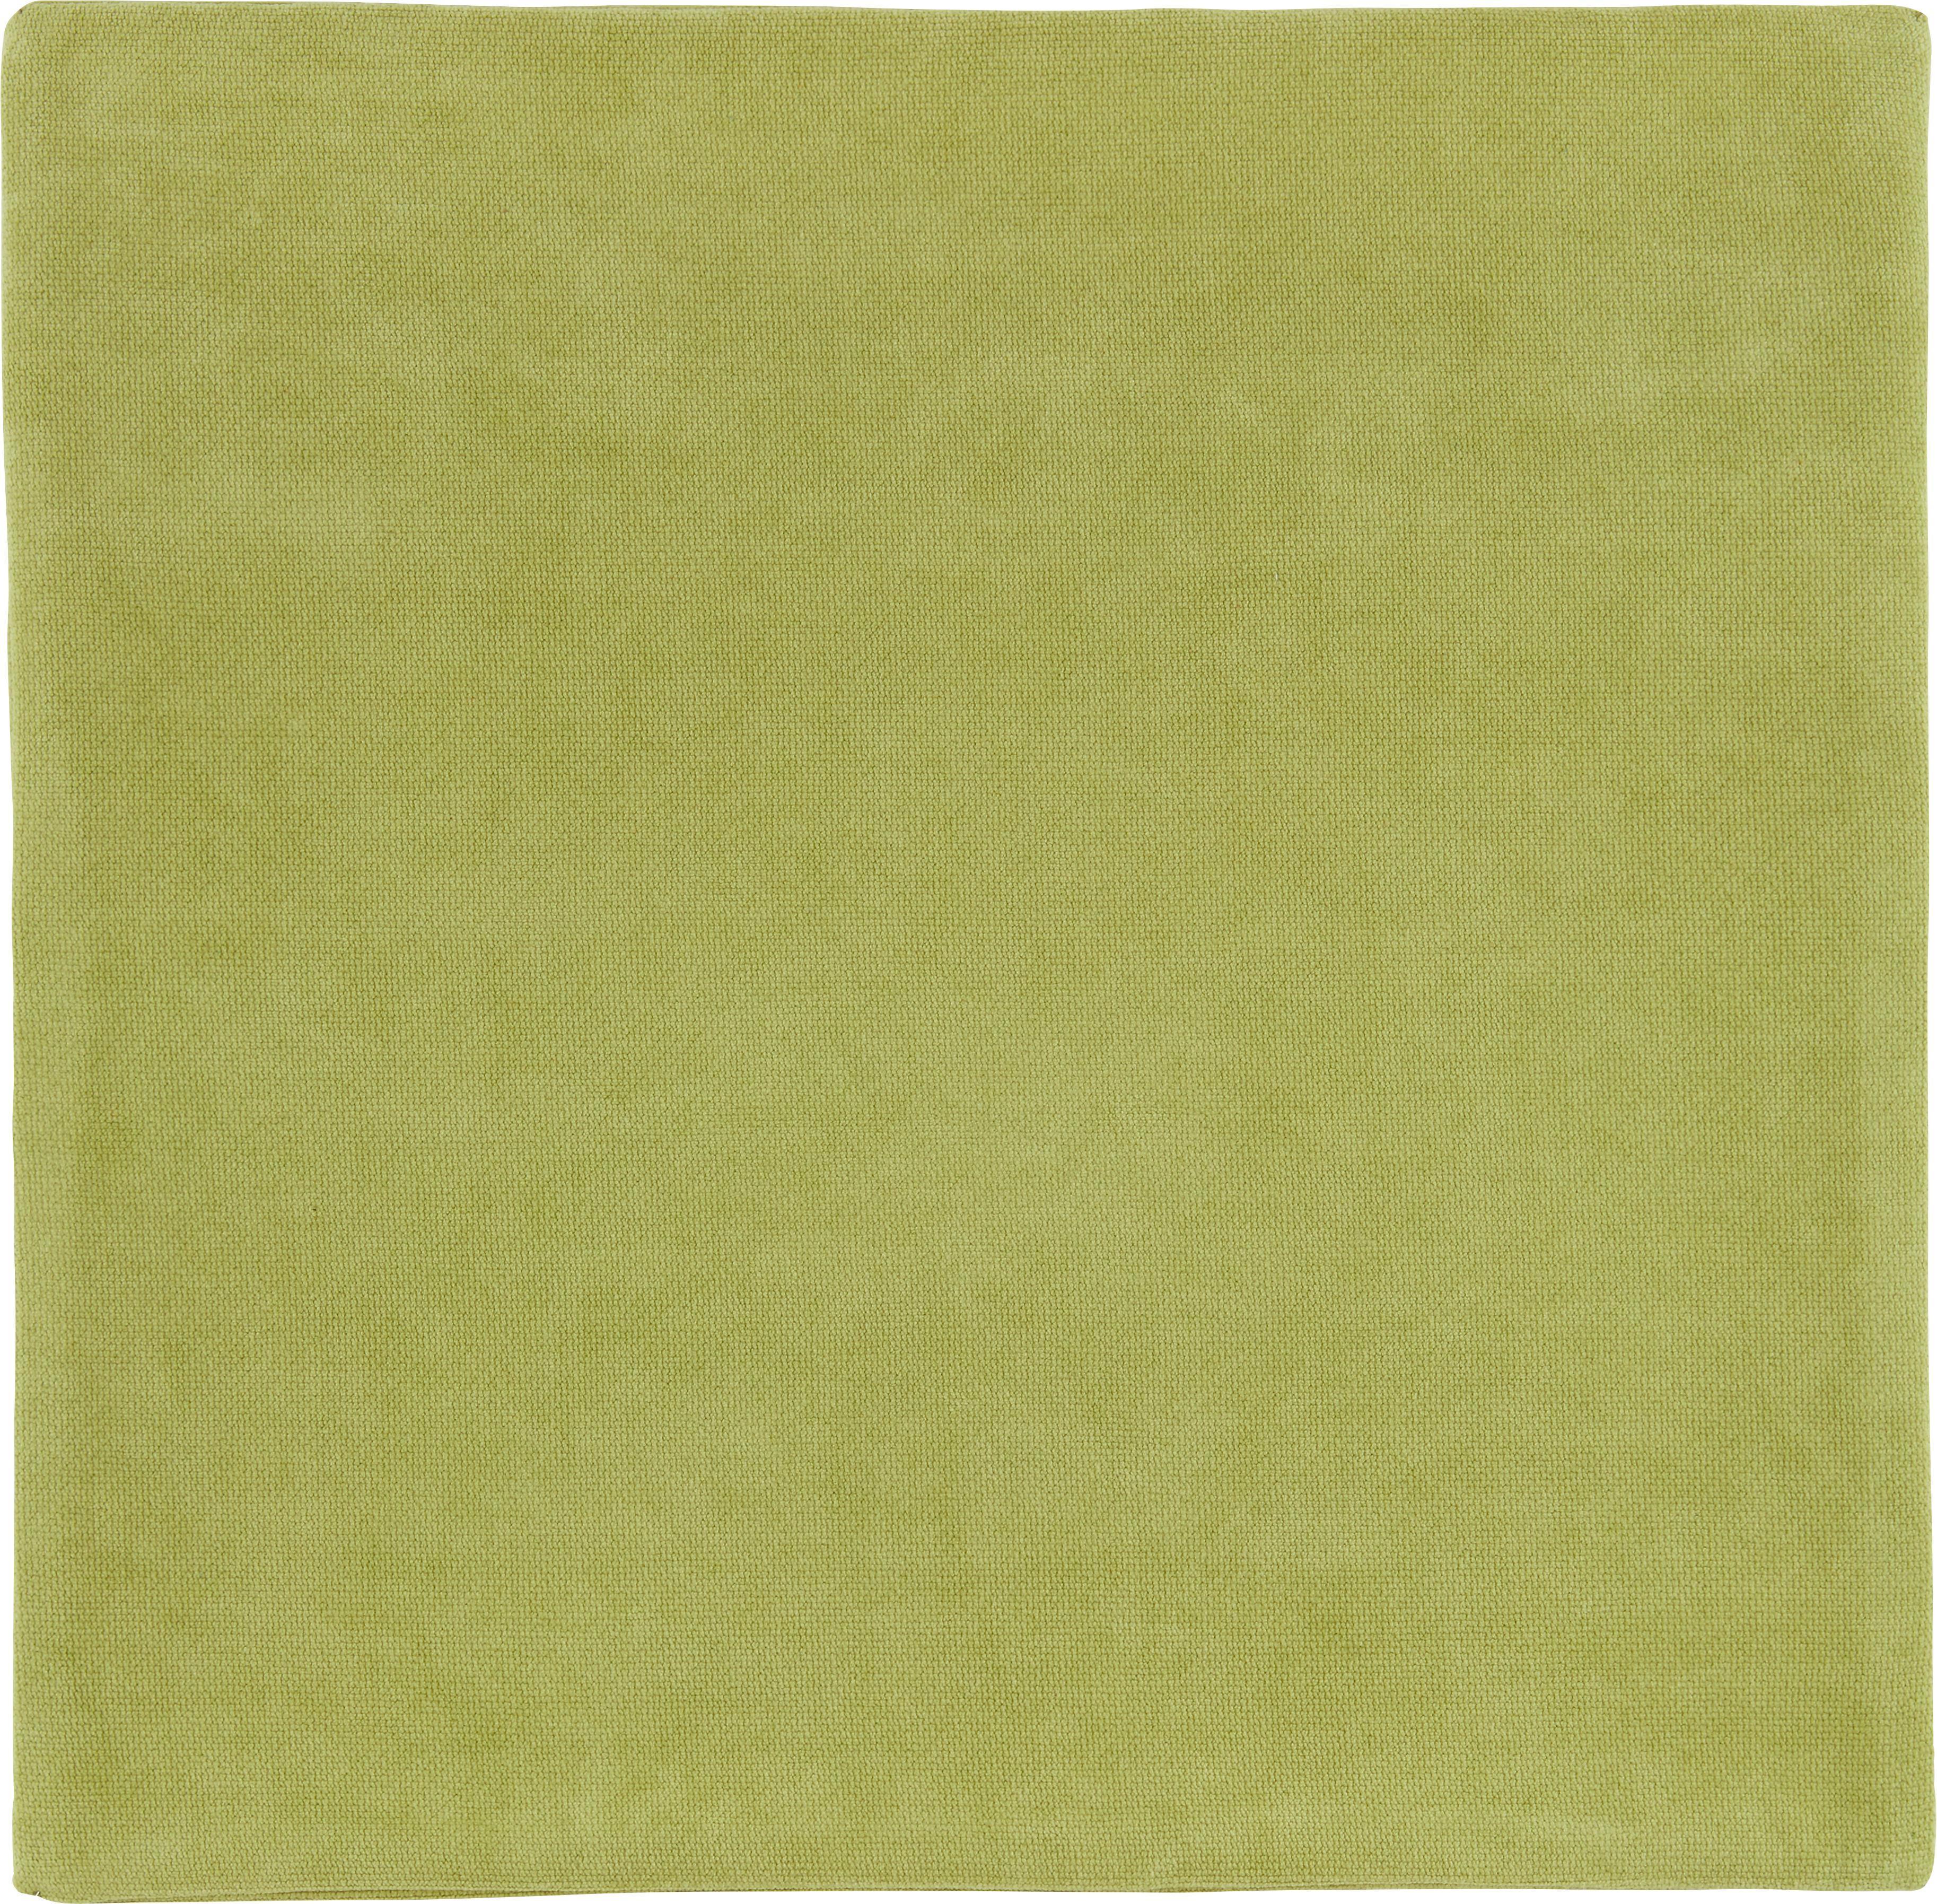 Povlak Na Polštář Marit - zelená, textil (40/40cm) - MÖMAX modern living